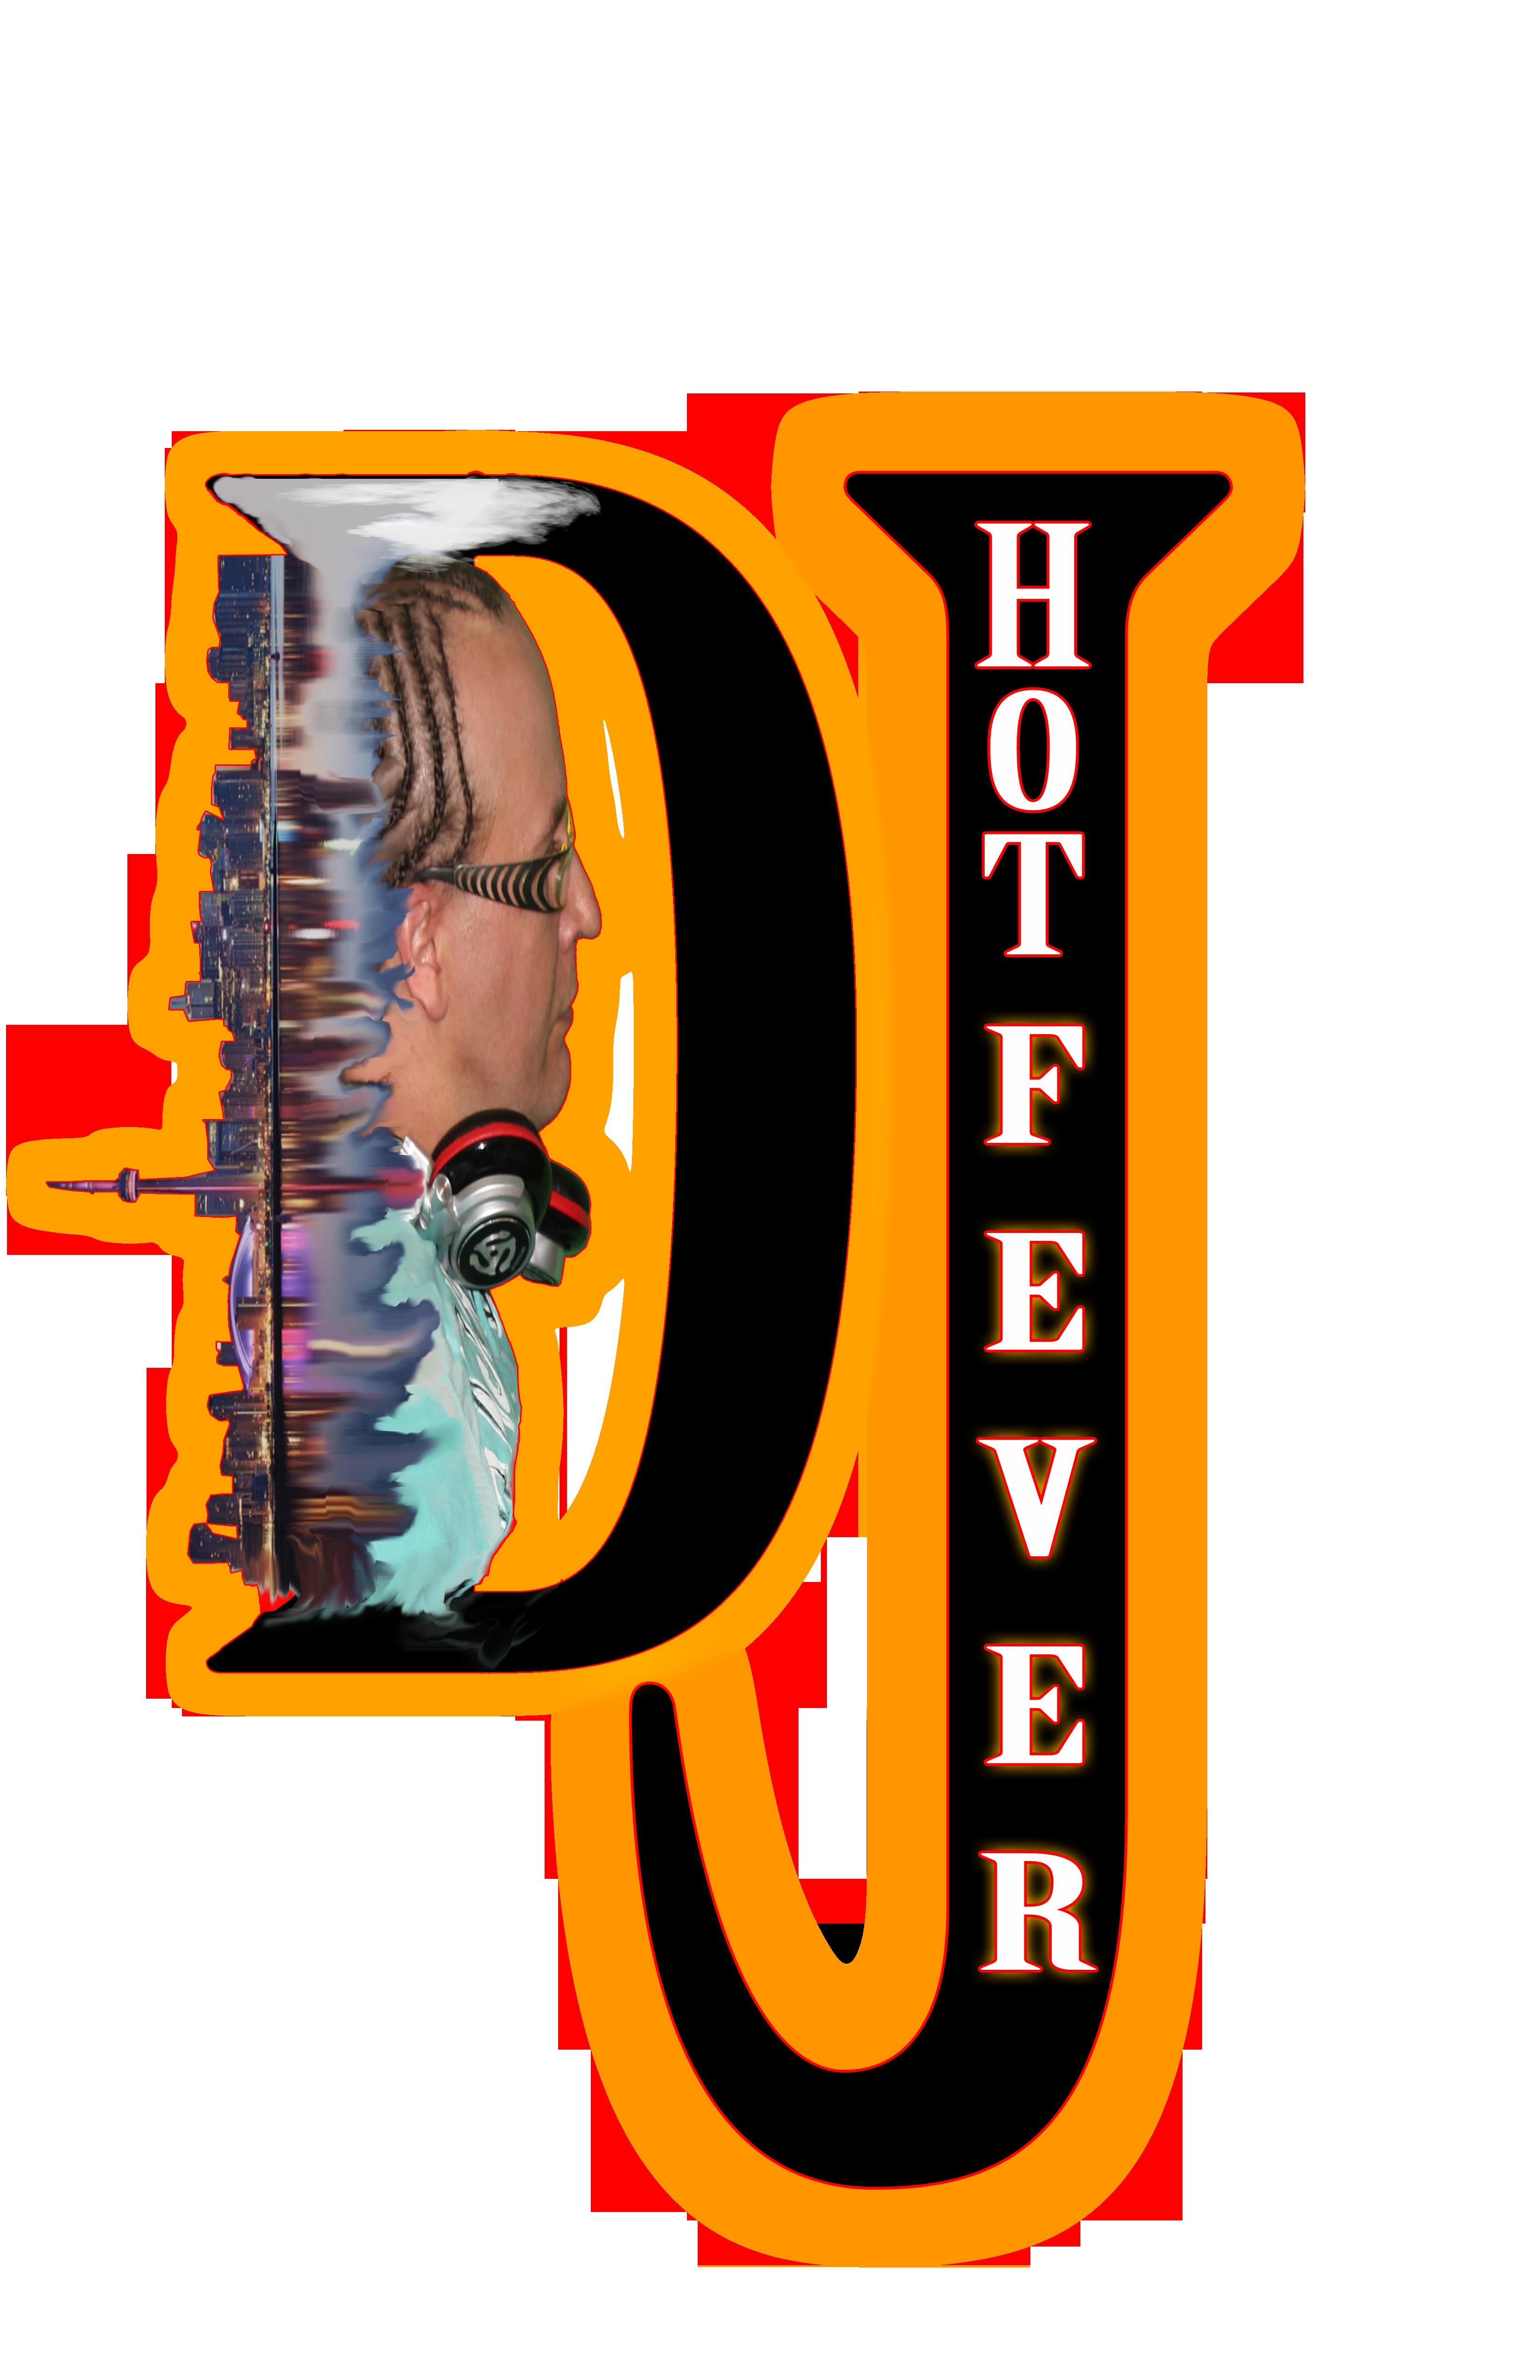 DJ HOT FEVER CD TOWER